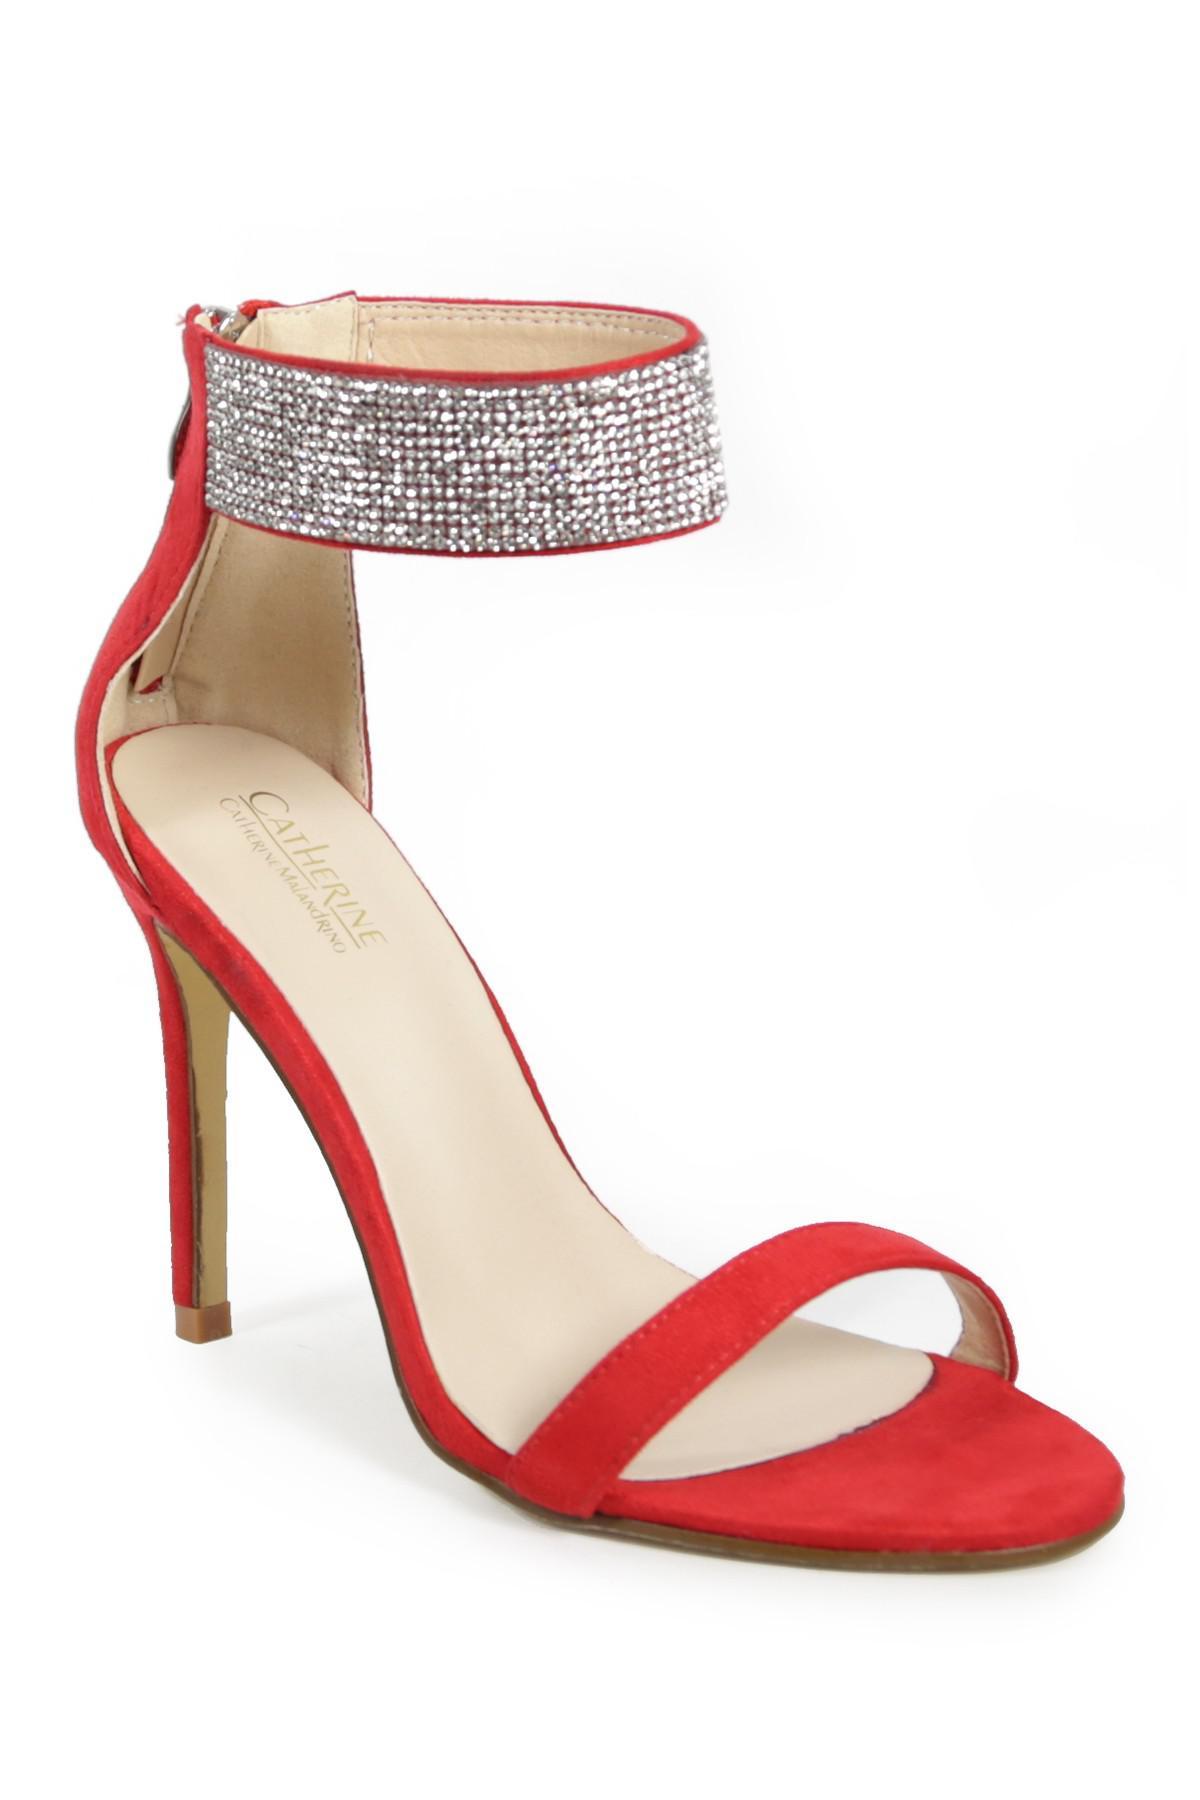 09130f21bf2 Lyst - Catherine Malandrino Stella Crystal Embellished Cuff Stiletto ...